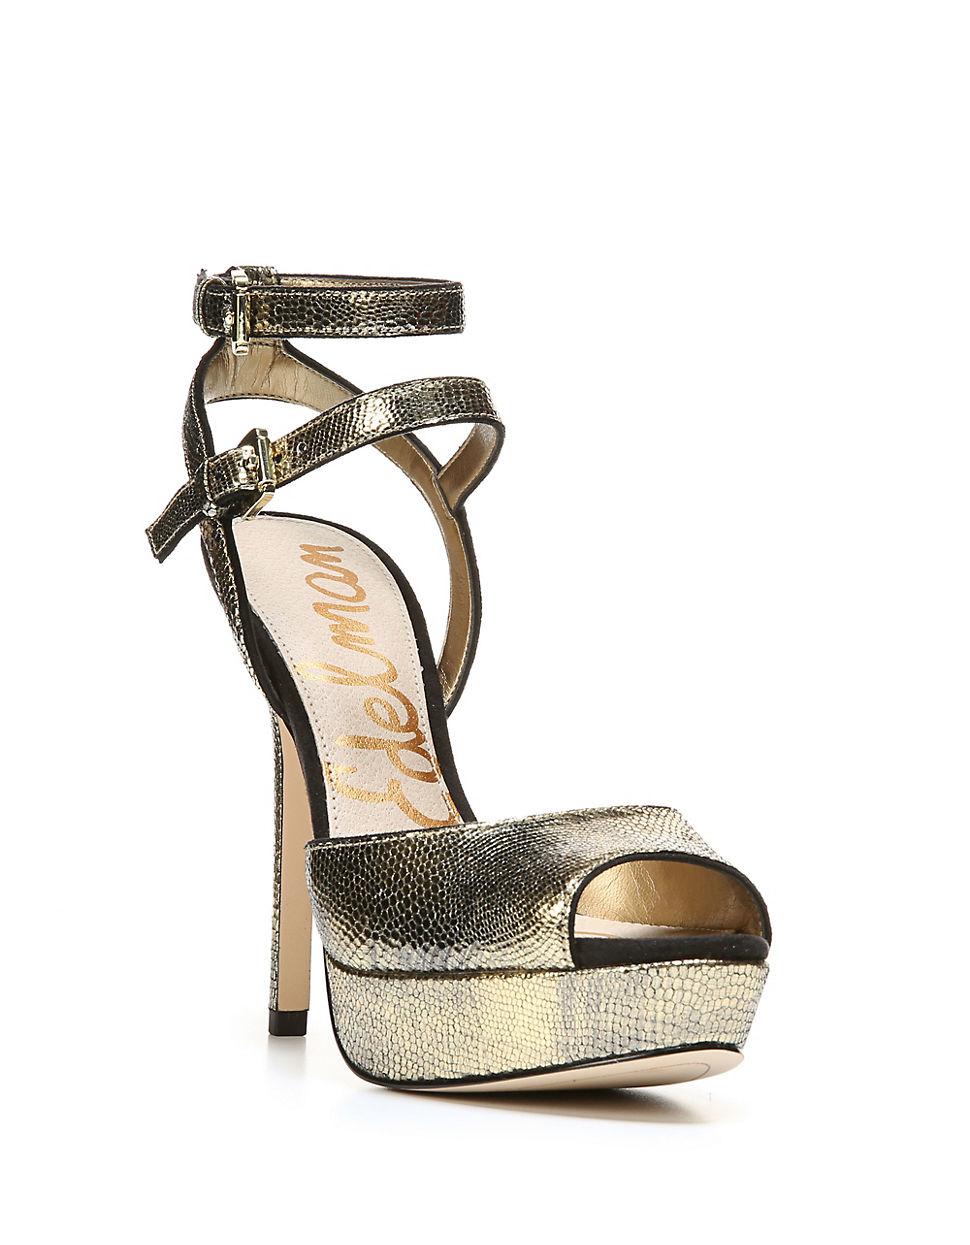 c335ba2c2d4 Sam Edelman Nadine Platform Leather Sandals in Natural - Lyst